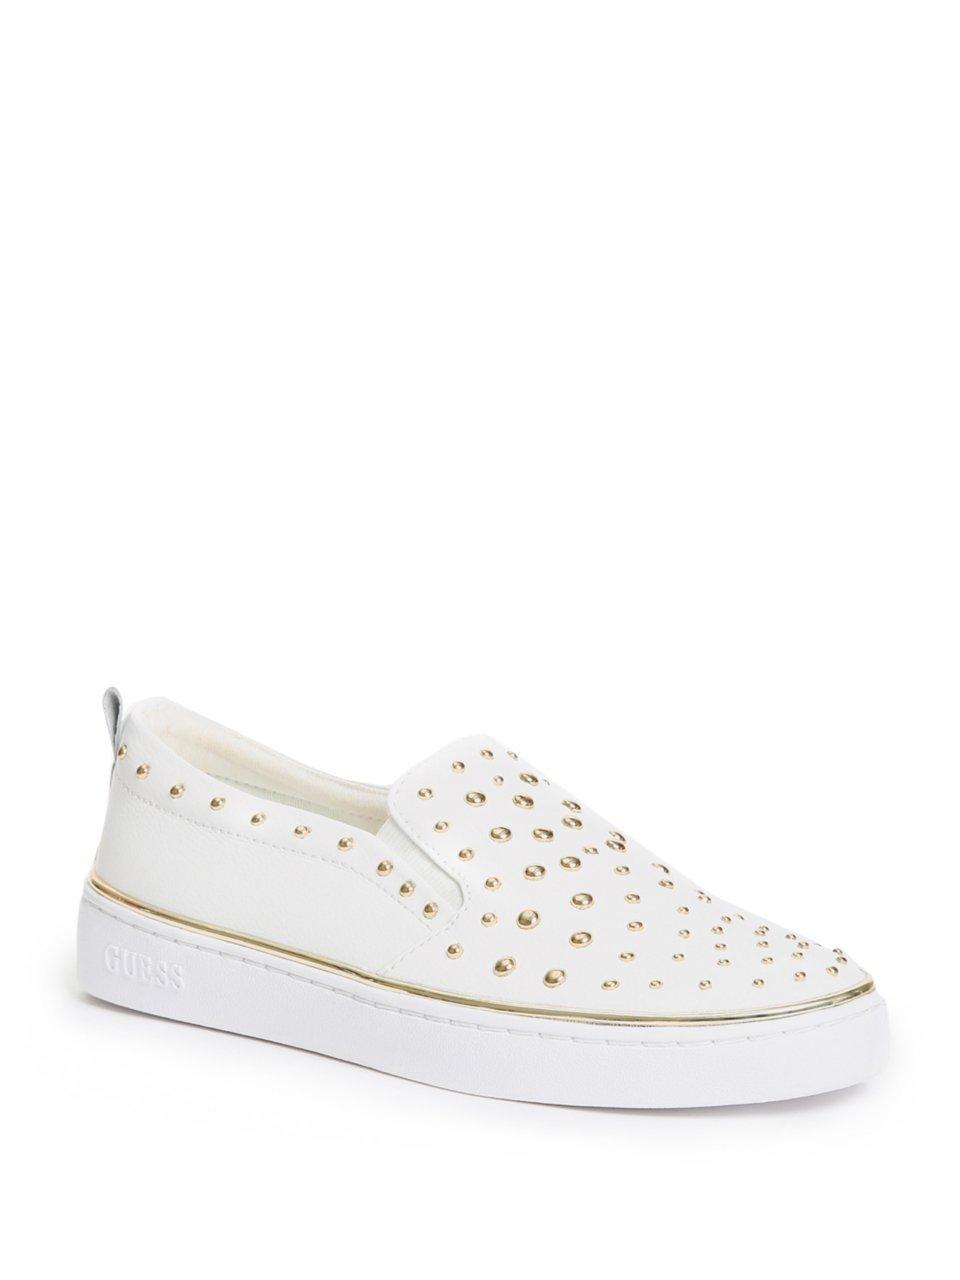 GUESS FLGOE1 LEA12 Zapatos Mujeres 37 EU|Blanco